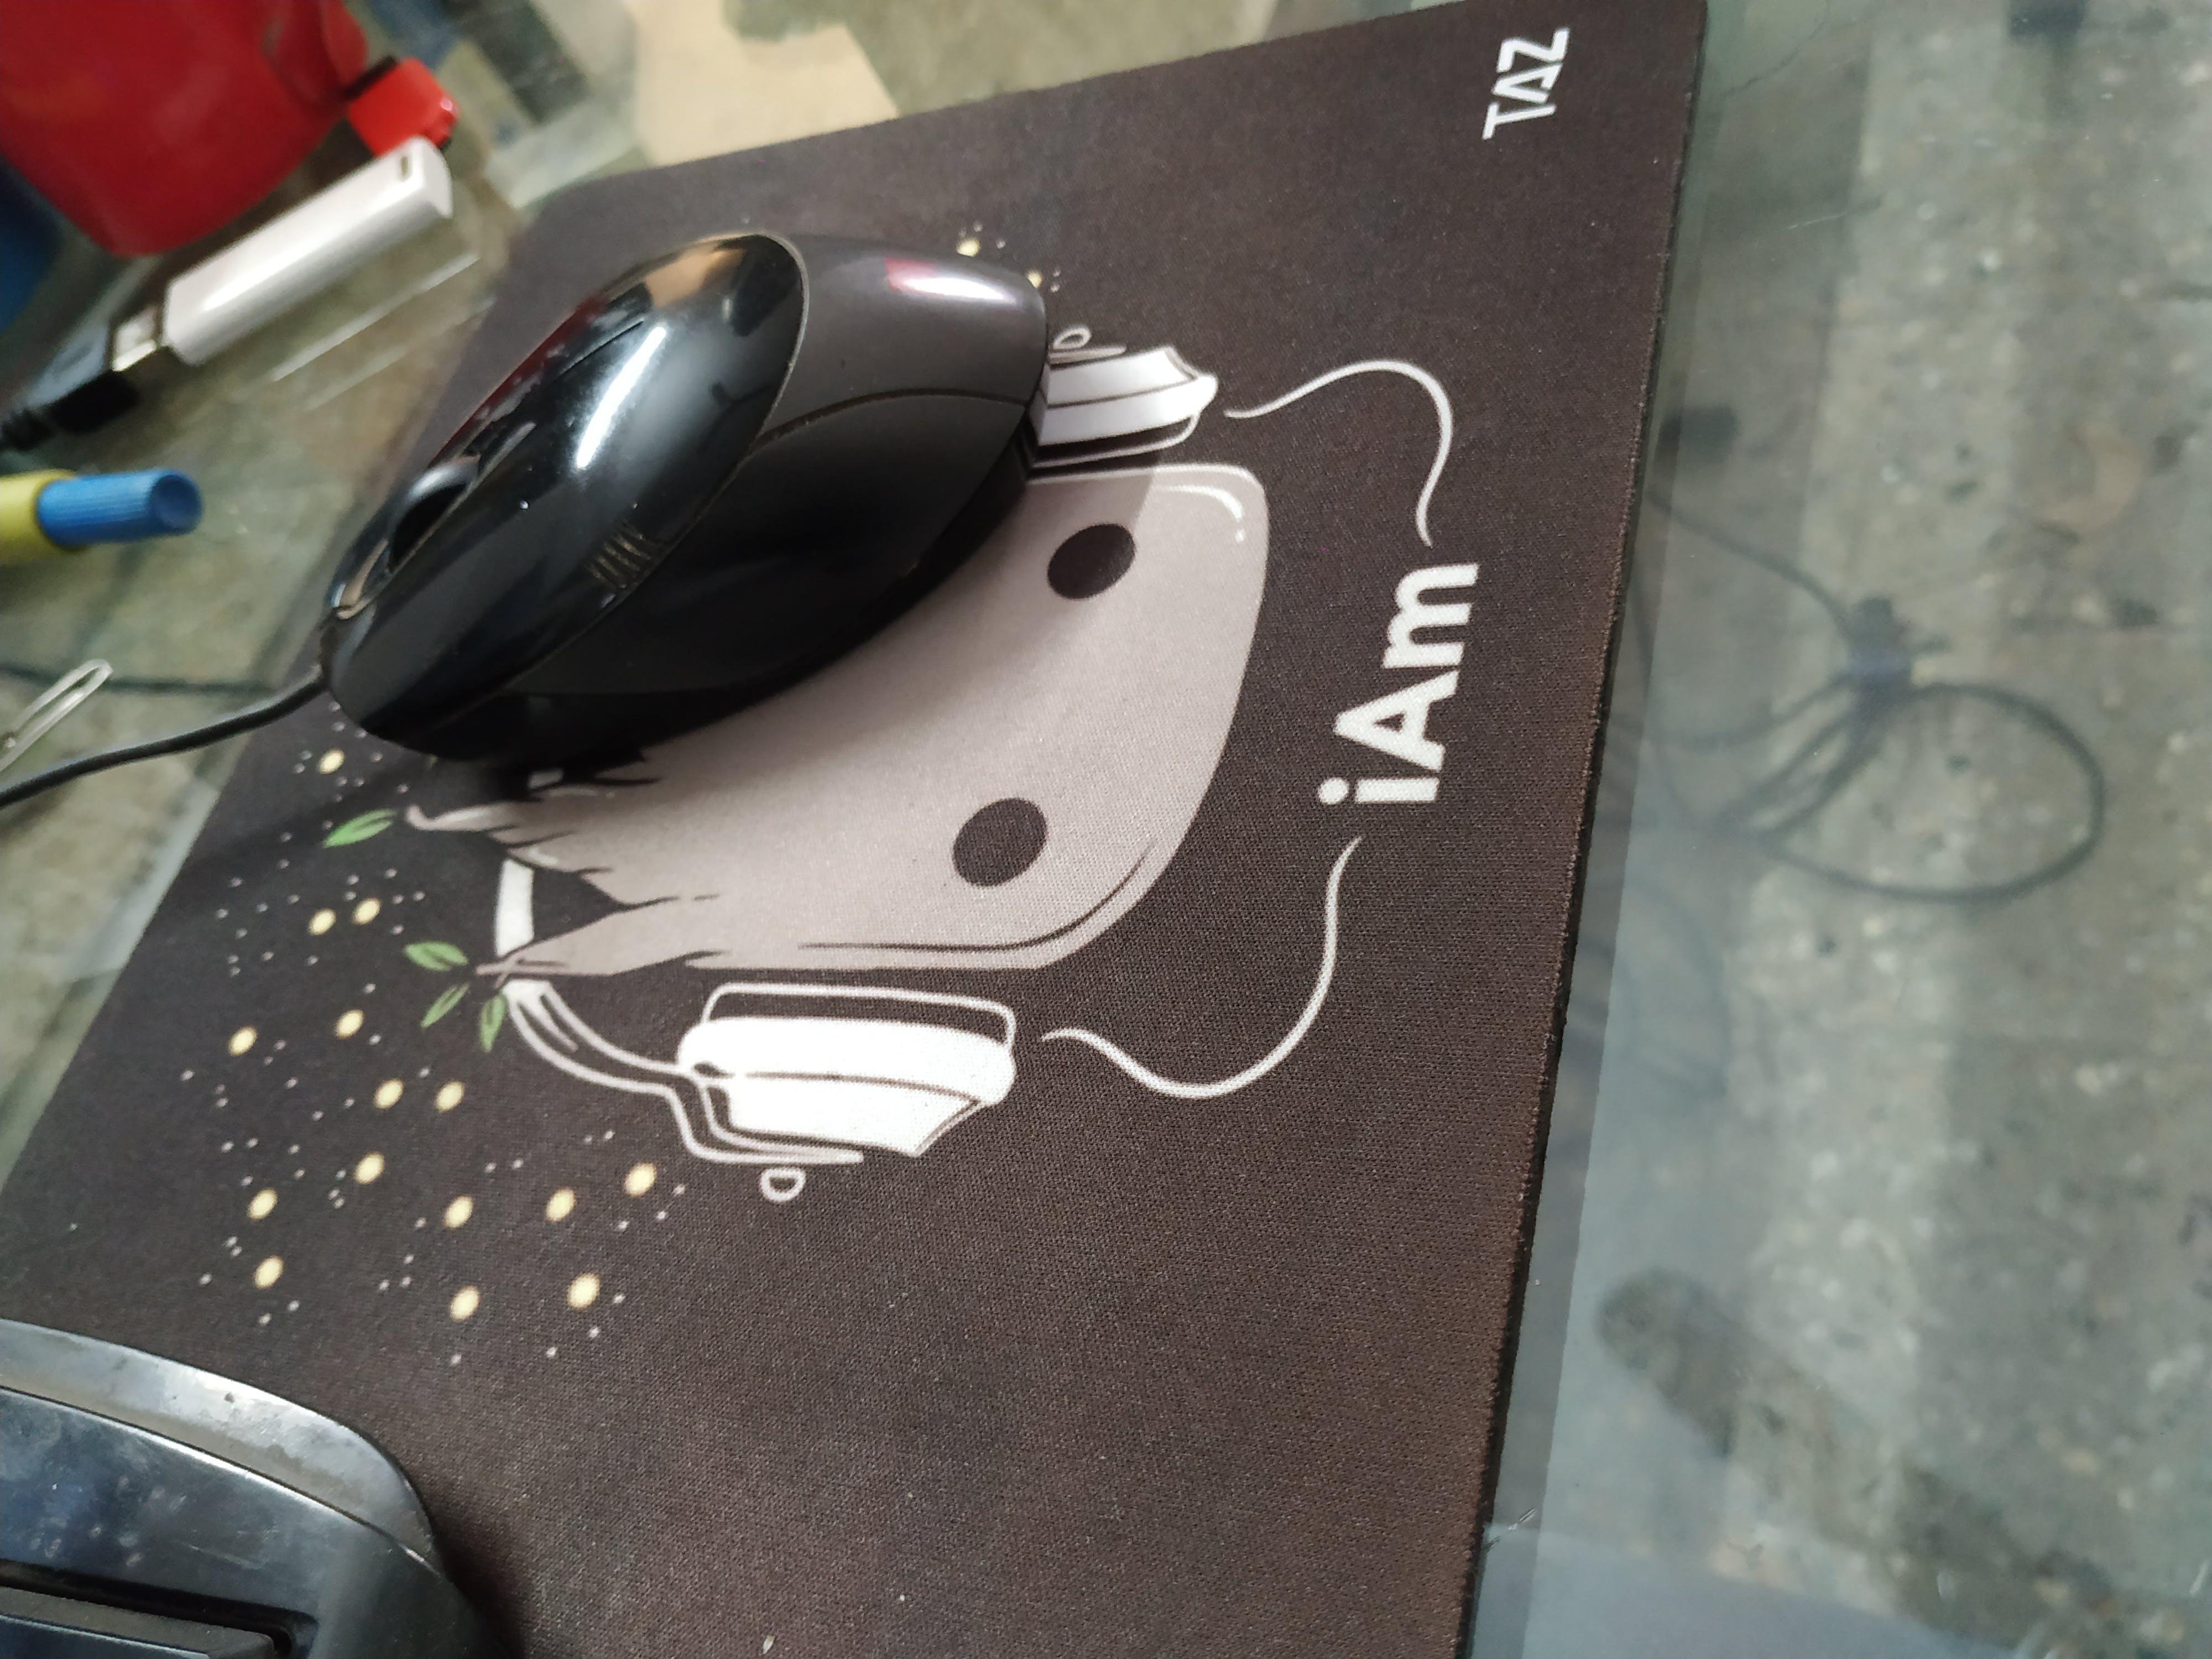 Minimal-I Am Groot Printed Mouse Pad